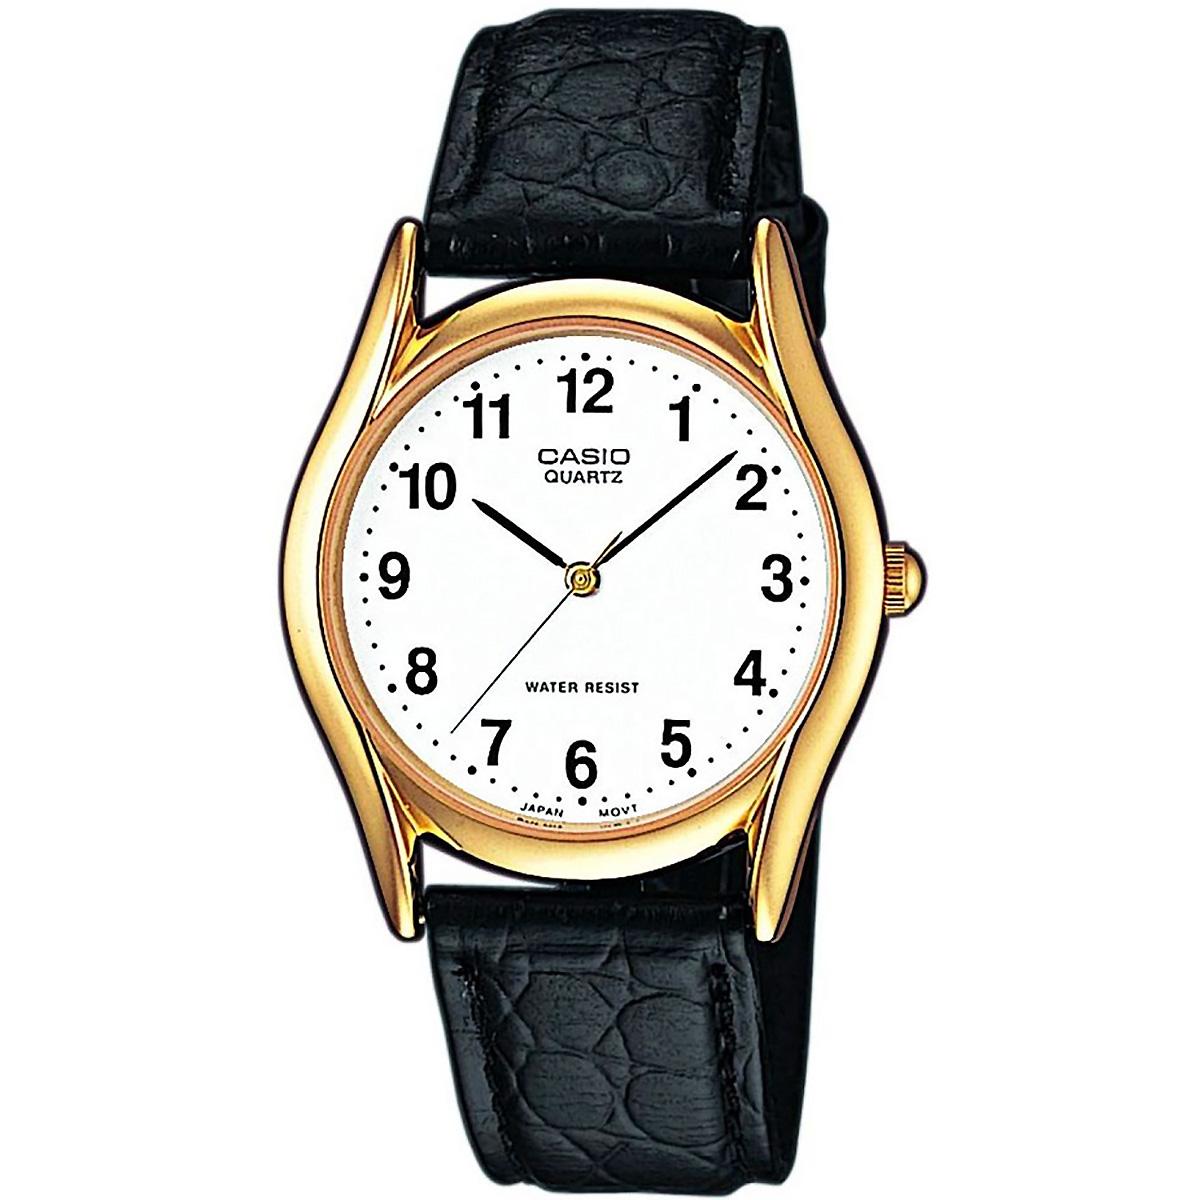 casio uhr mtp 1154pq 7b herren armbanduhr leder wei gold. Black Bedroom Furniture Sets. Home Design Ideas